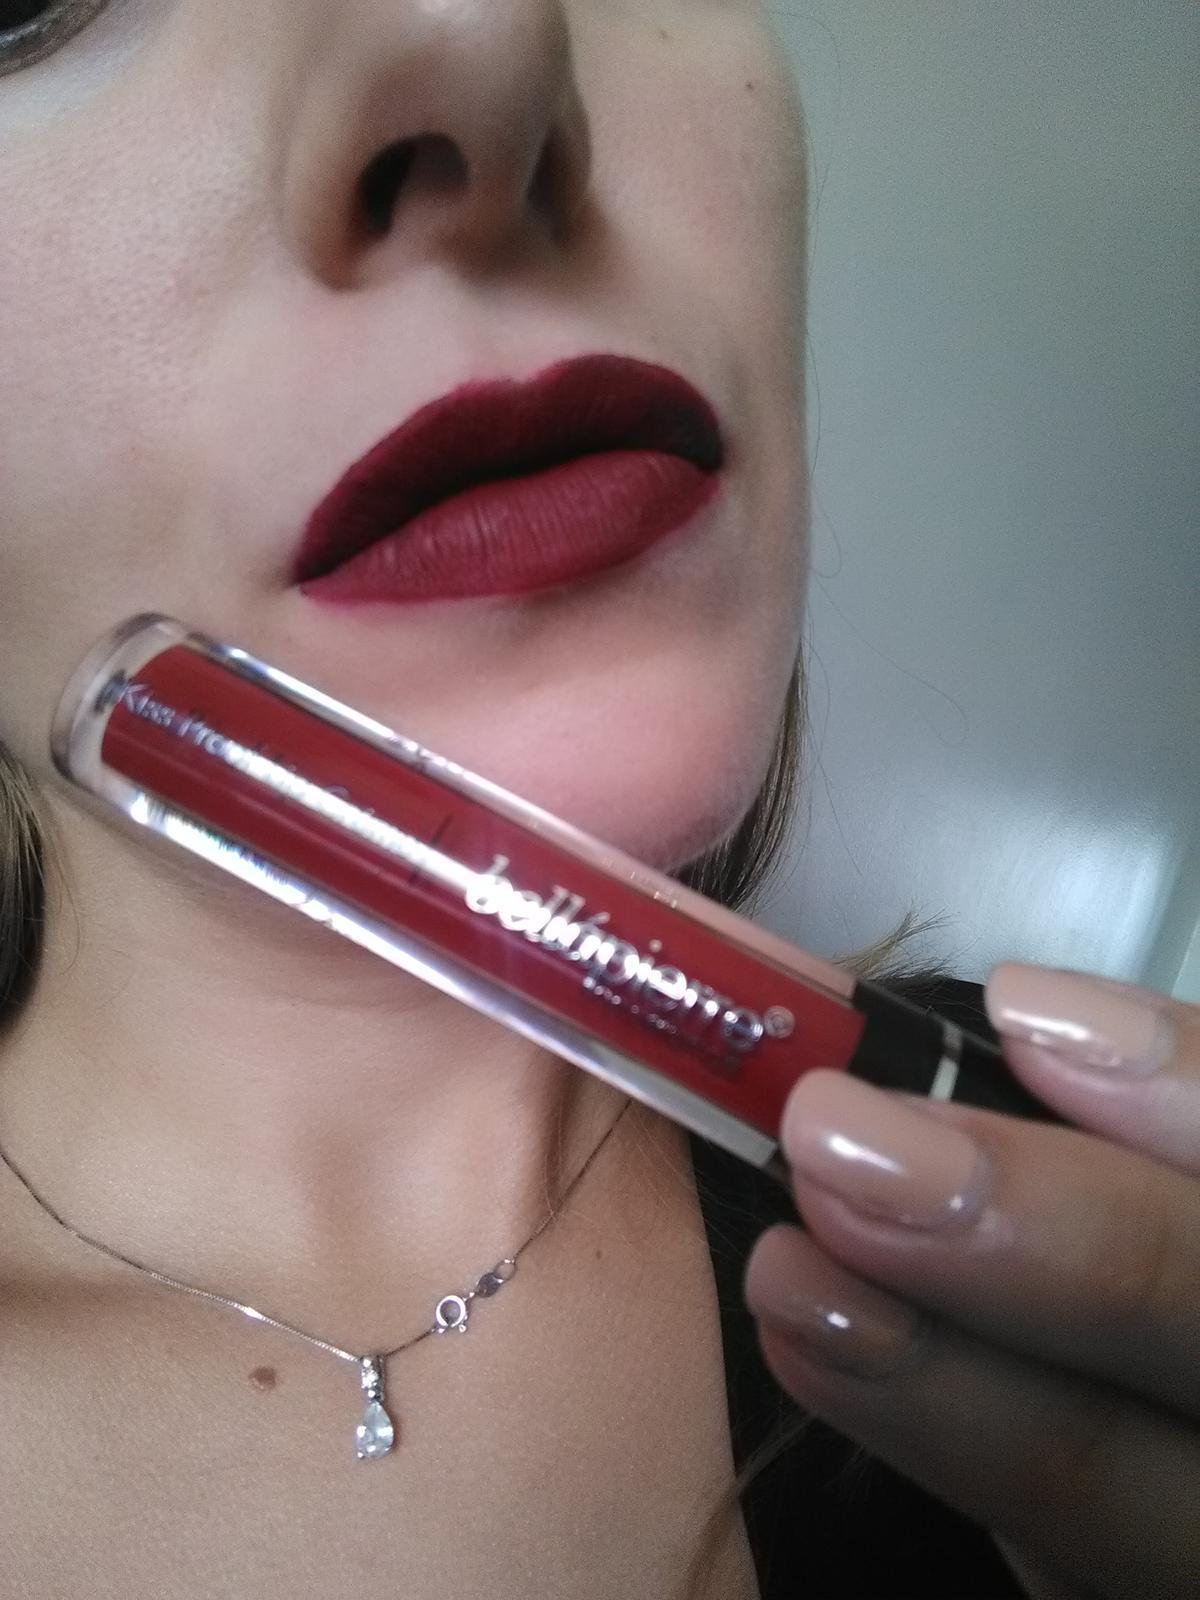 Bellapierre - červený matný rúž - Obrázok č. 3